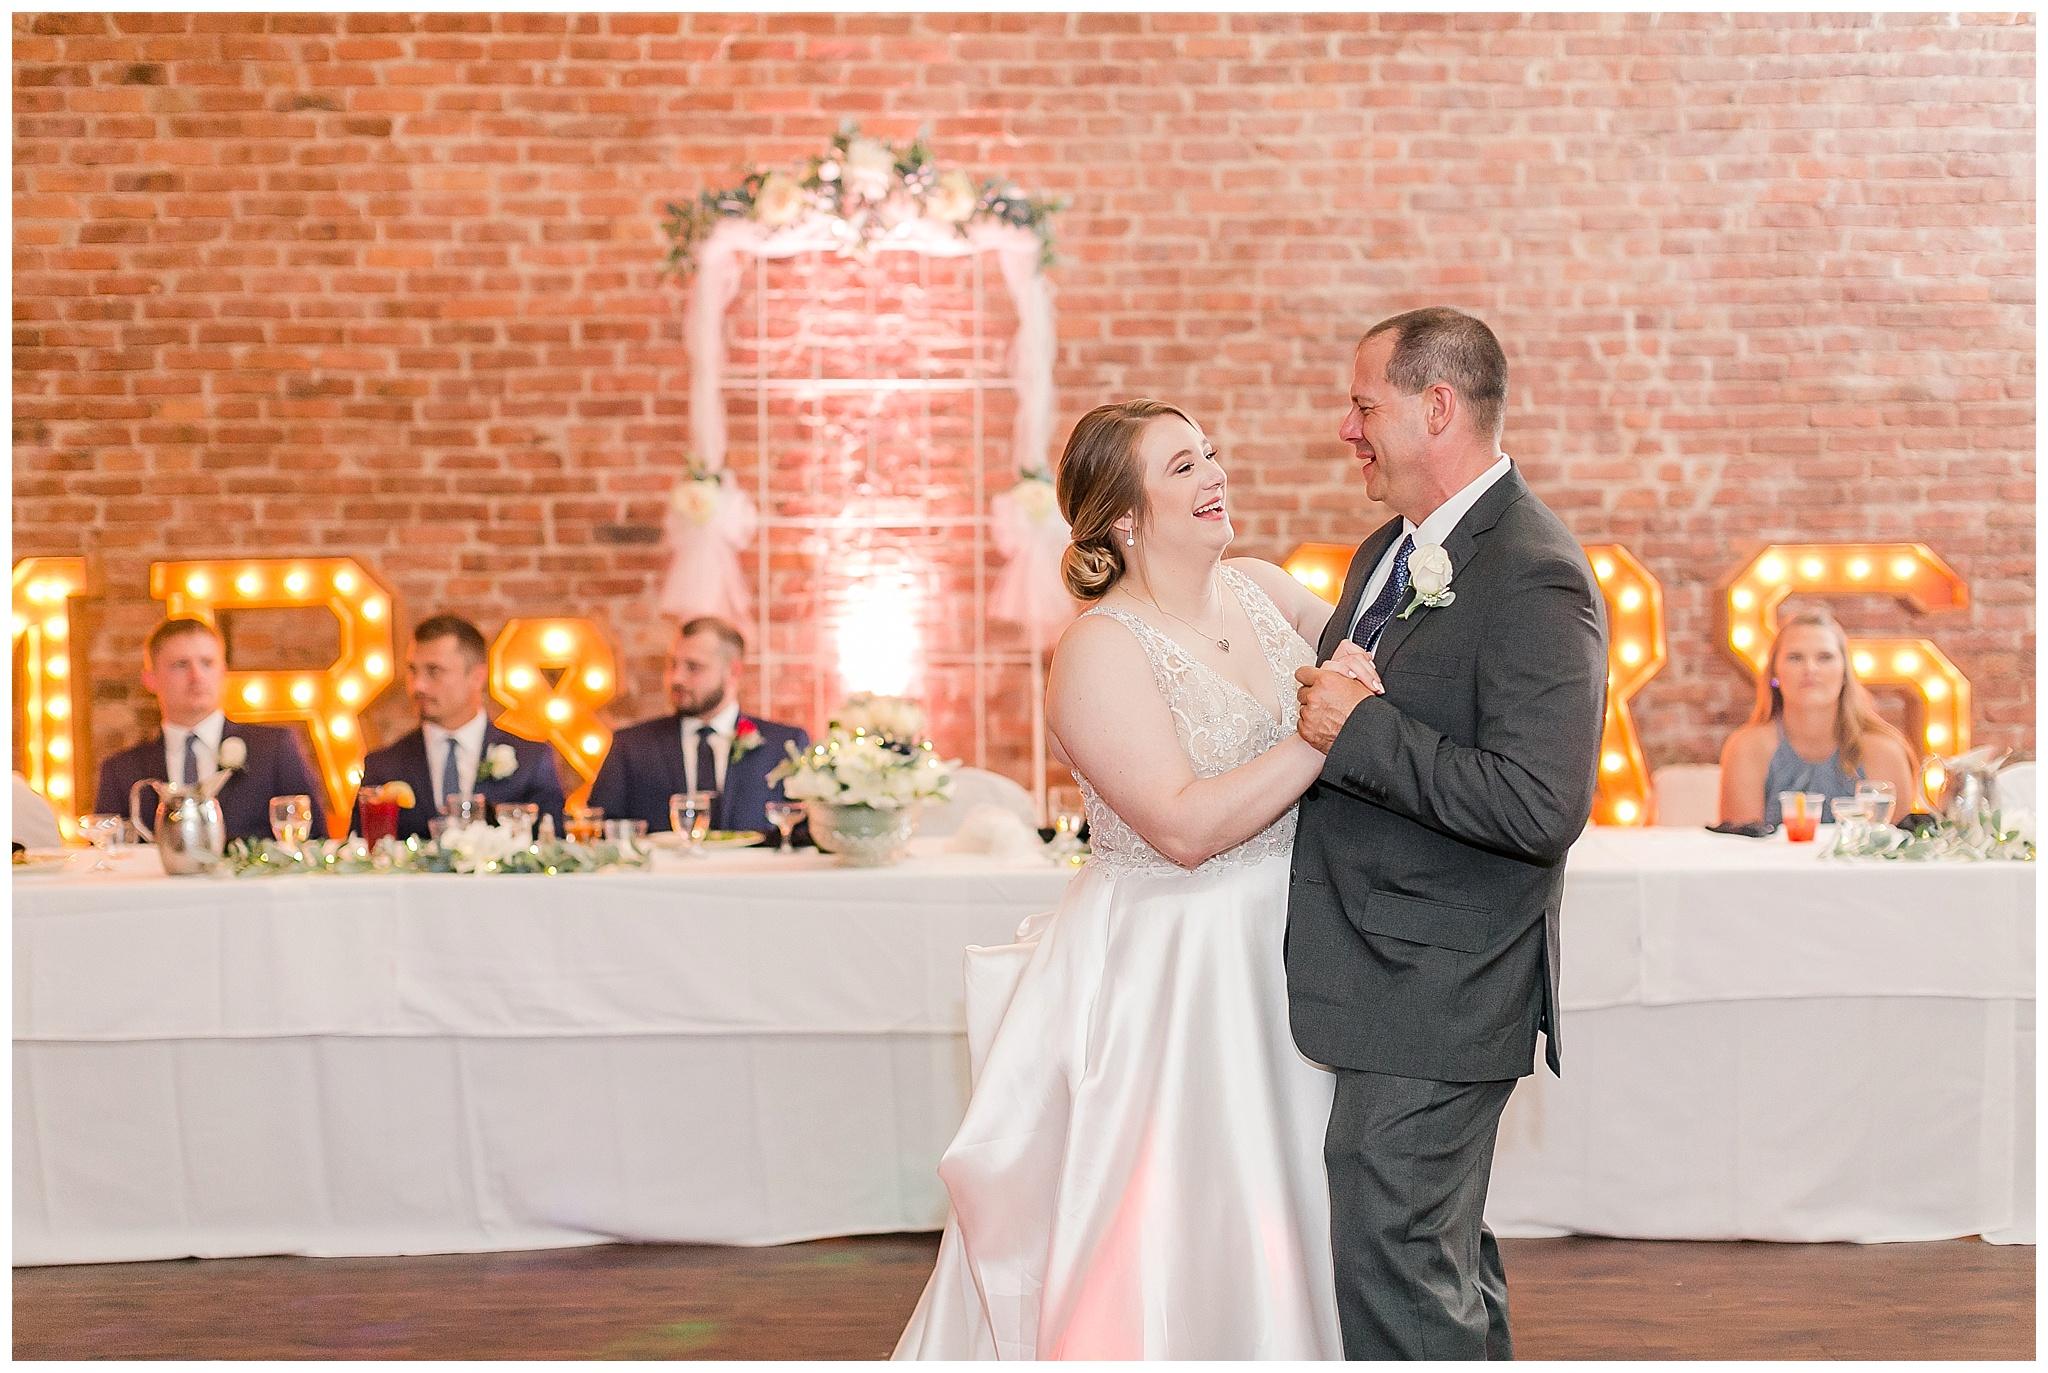 la_casa_grande_wedding_beloit_wisconsin_caynay_photo_0040.jpg